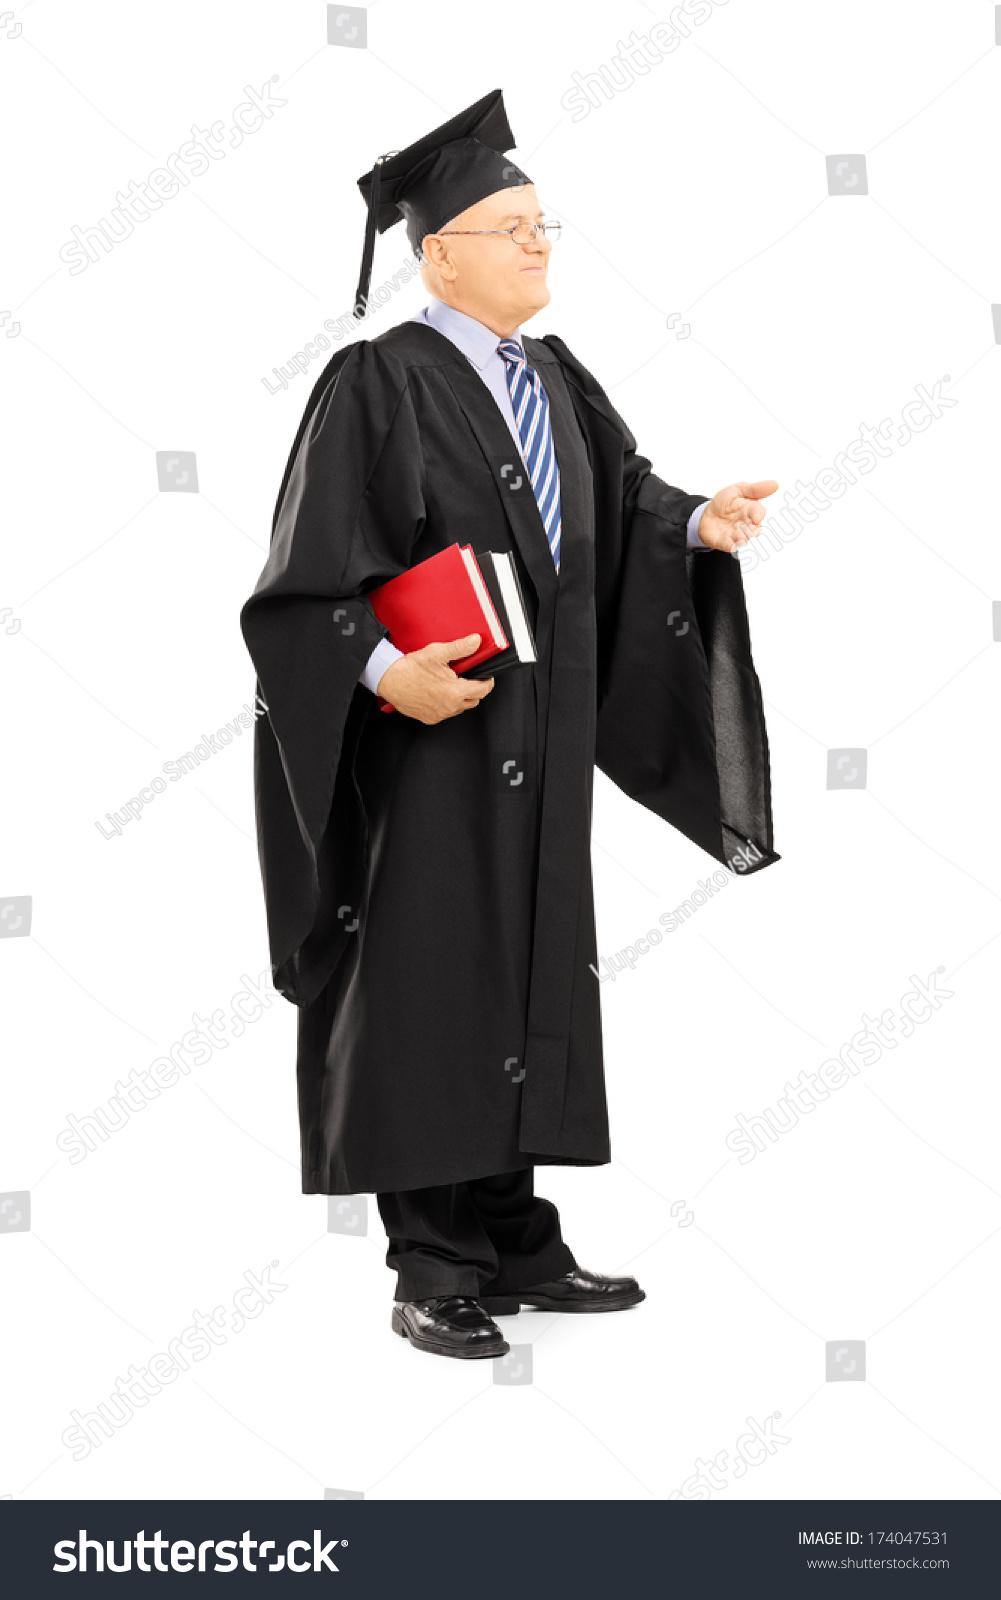 Full Length Portrait College Professor Graduation Stock Photo (Edit ...